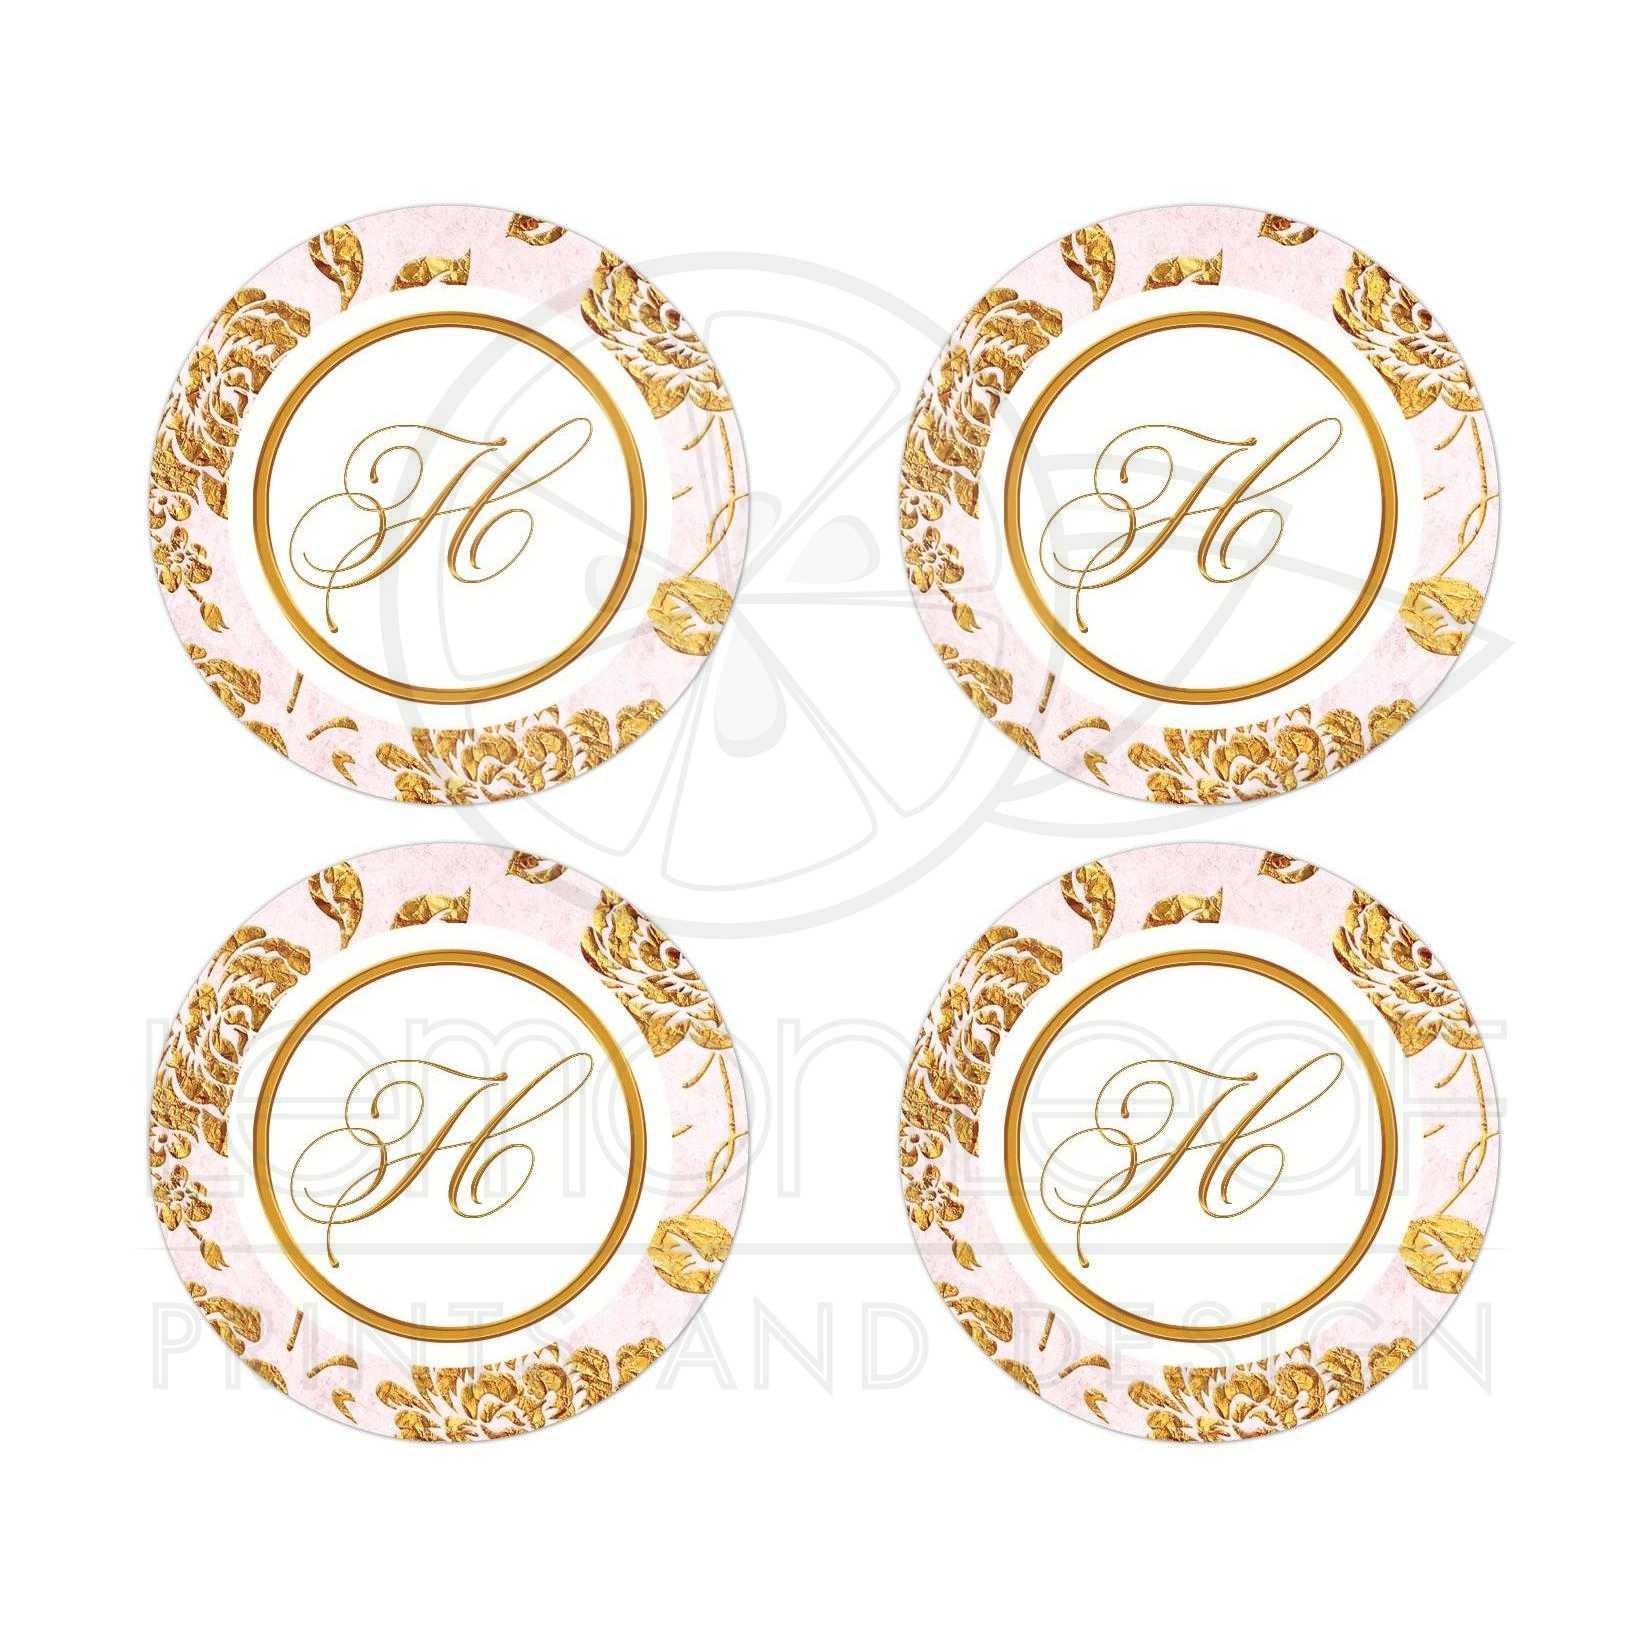 wedding stickers - Dorit.mercatodos.co